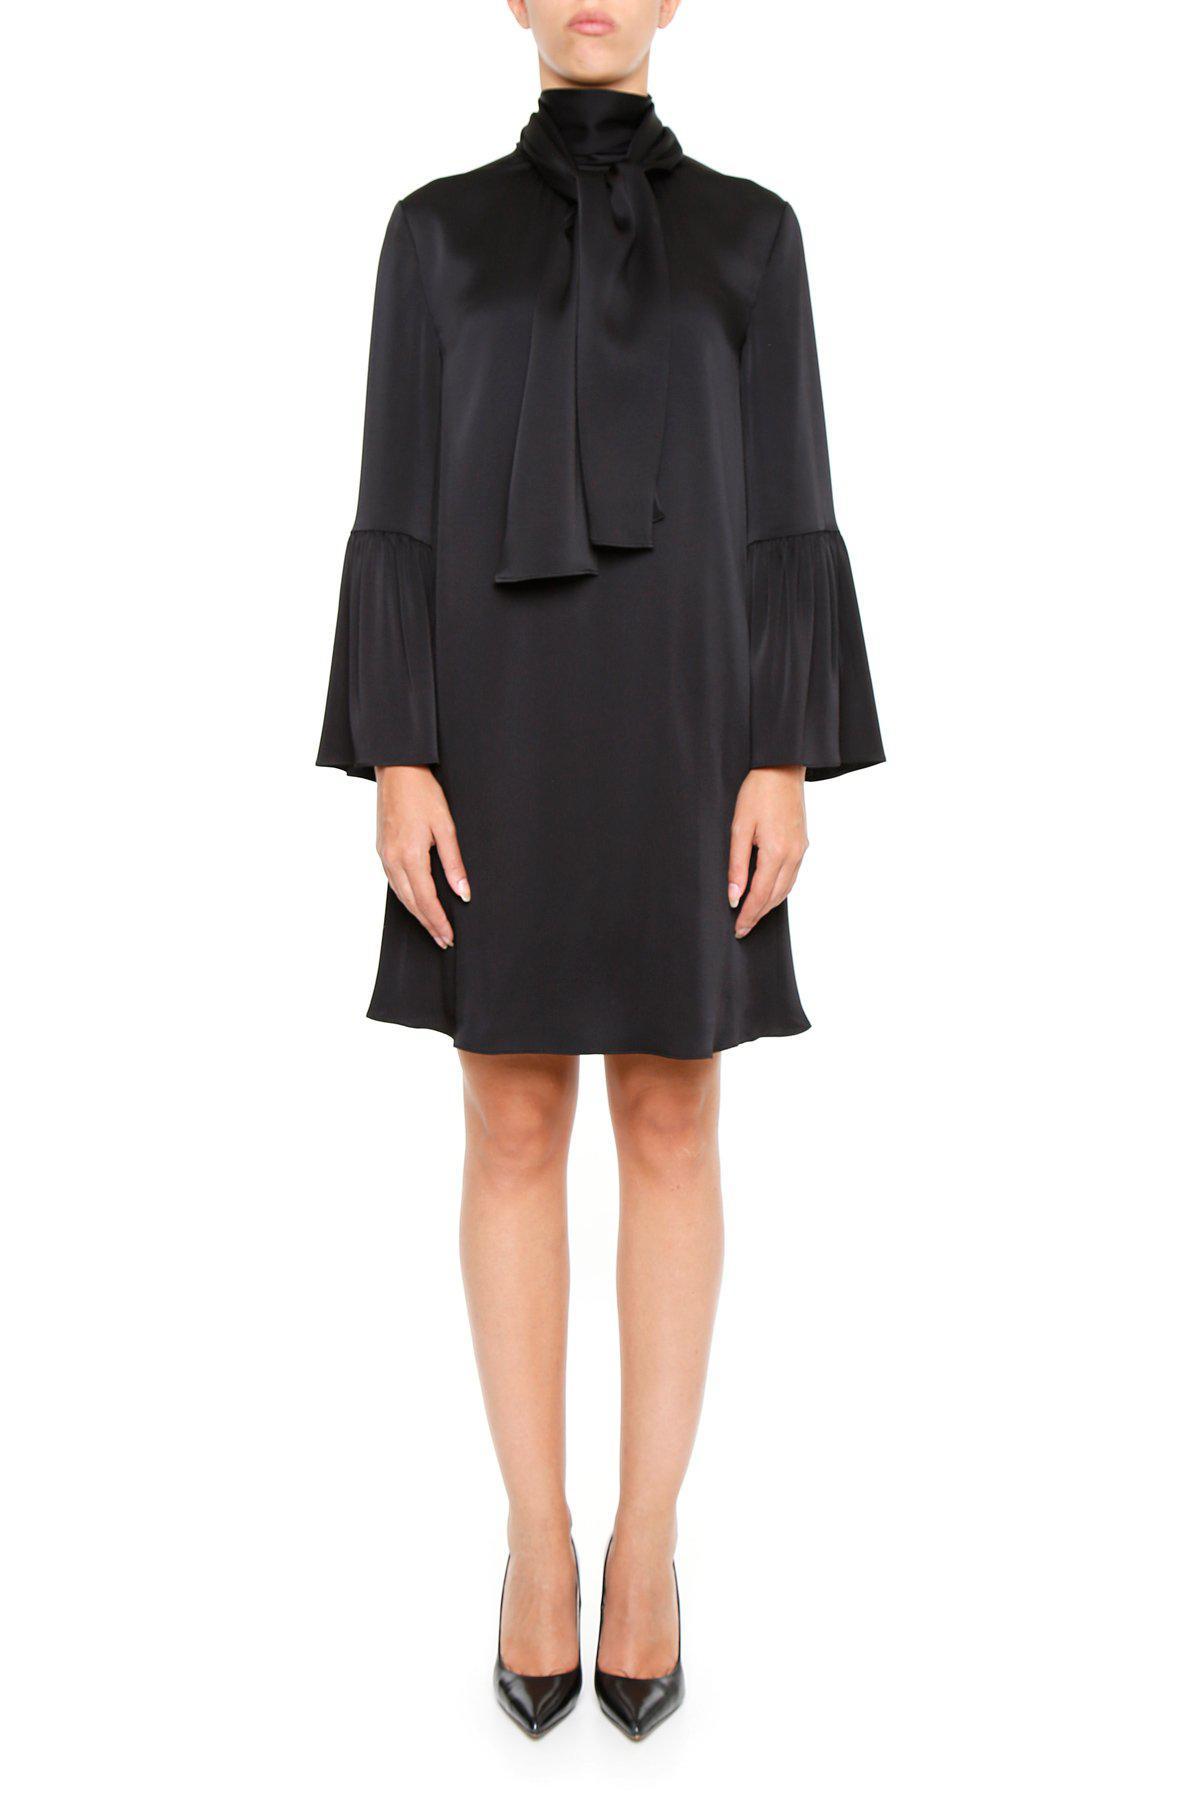 4432e46d2eb Lyst - Fendi Bell Sleeve Dress in Black